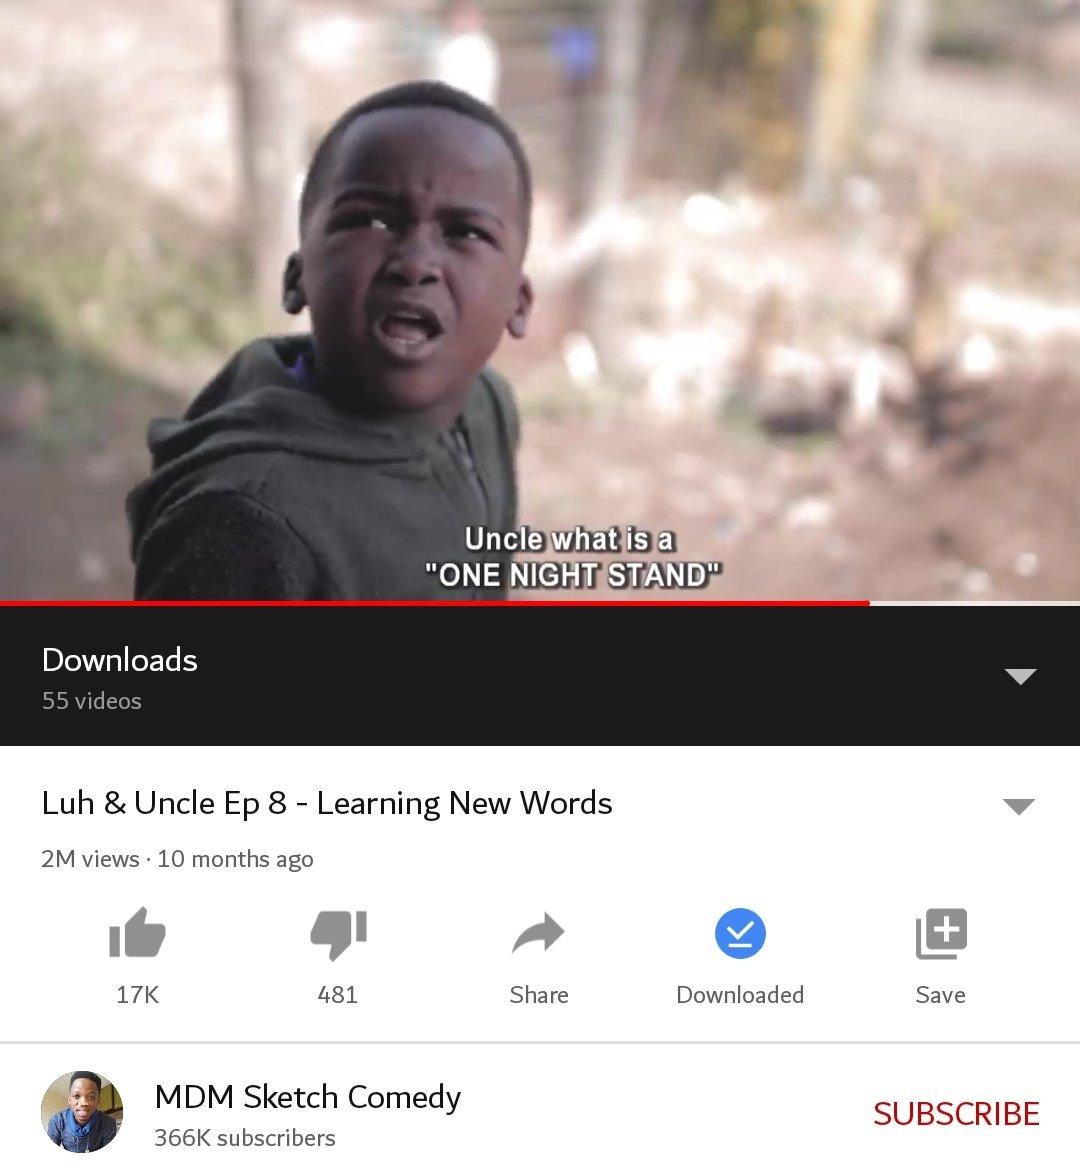 This kid is gaining legendary status 😂😂😂 Luh #LuhAndUncle https://t.co/Wip1DOsvUr